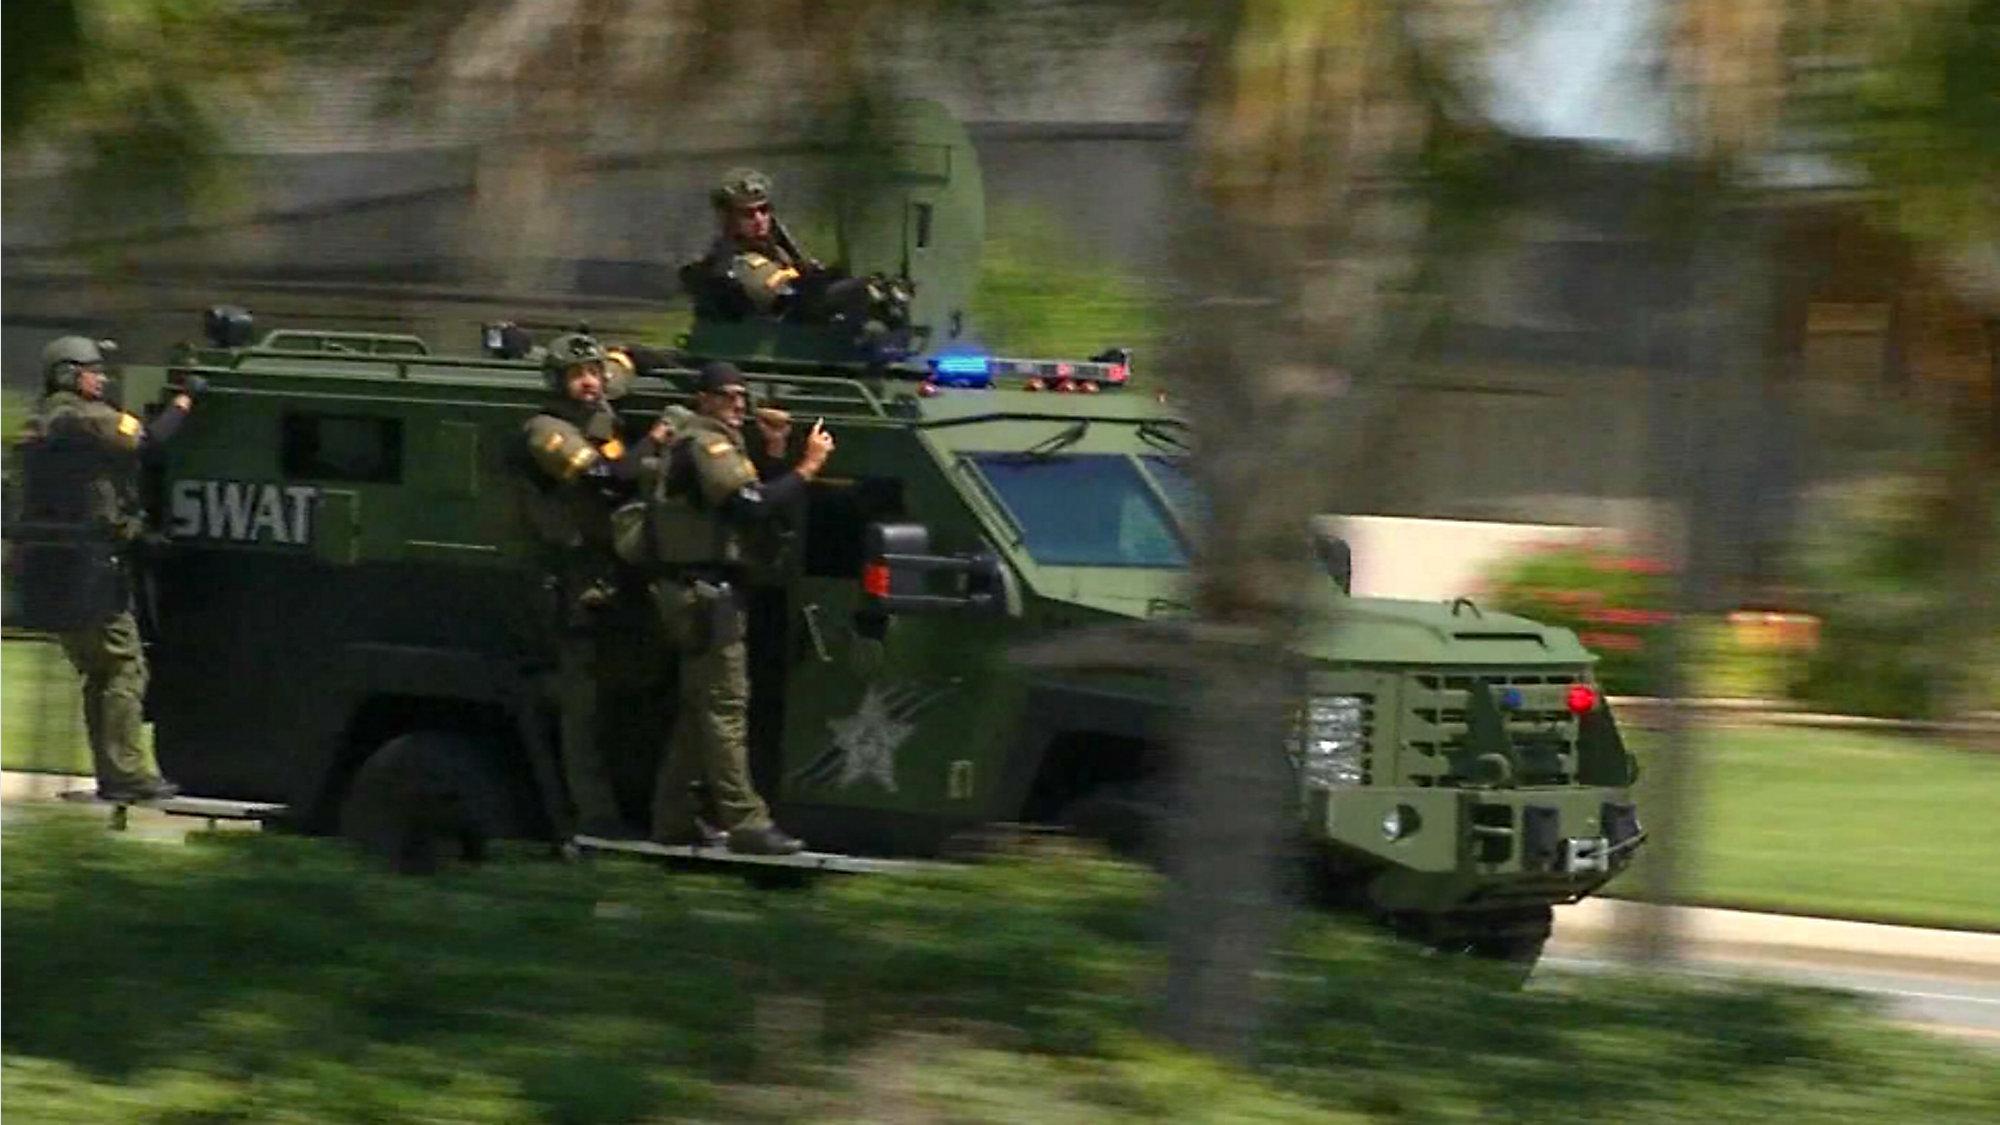 Sumter County | Orlando Florida Local News | Spectrum News 13